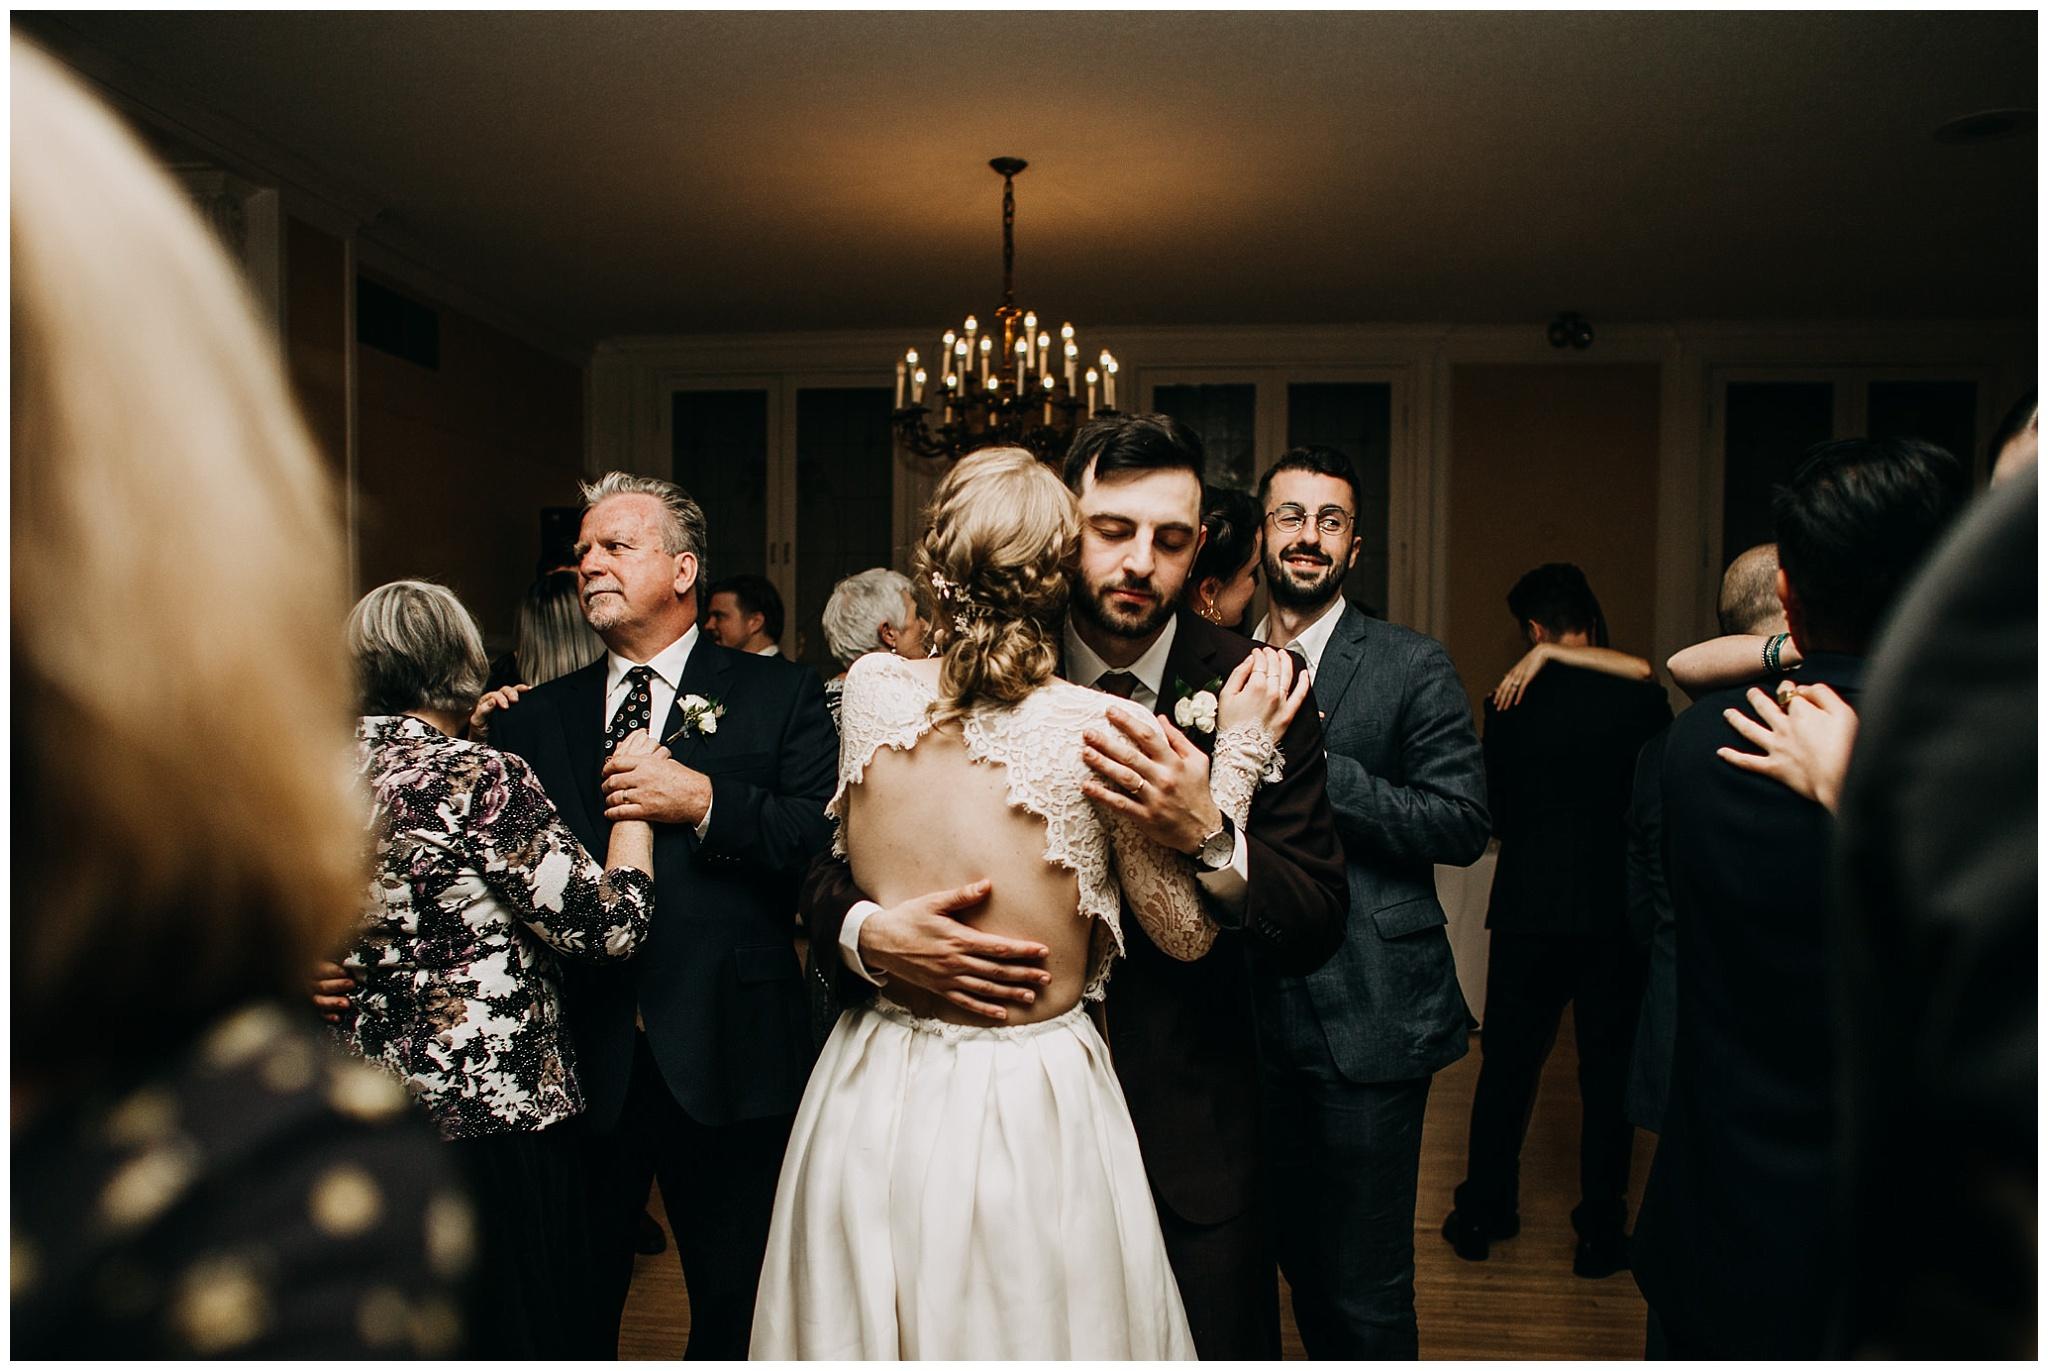 Bride and groom slow dancing on dance floor at Hycroft Manor wedding